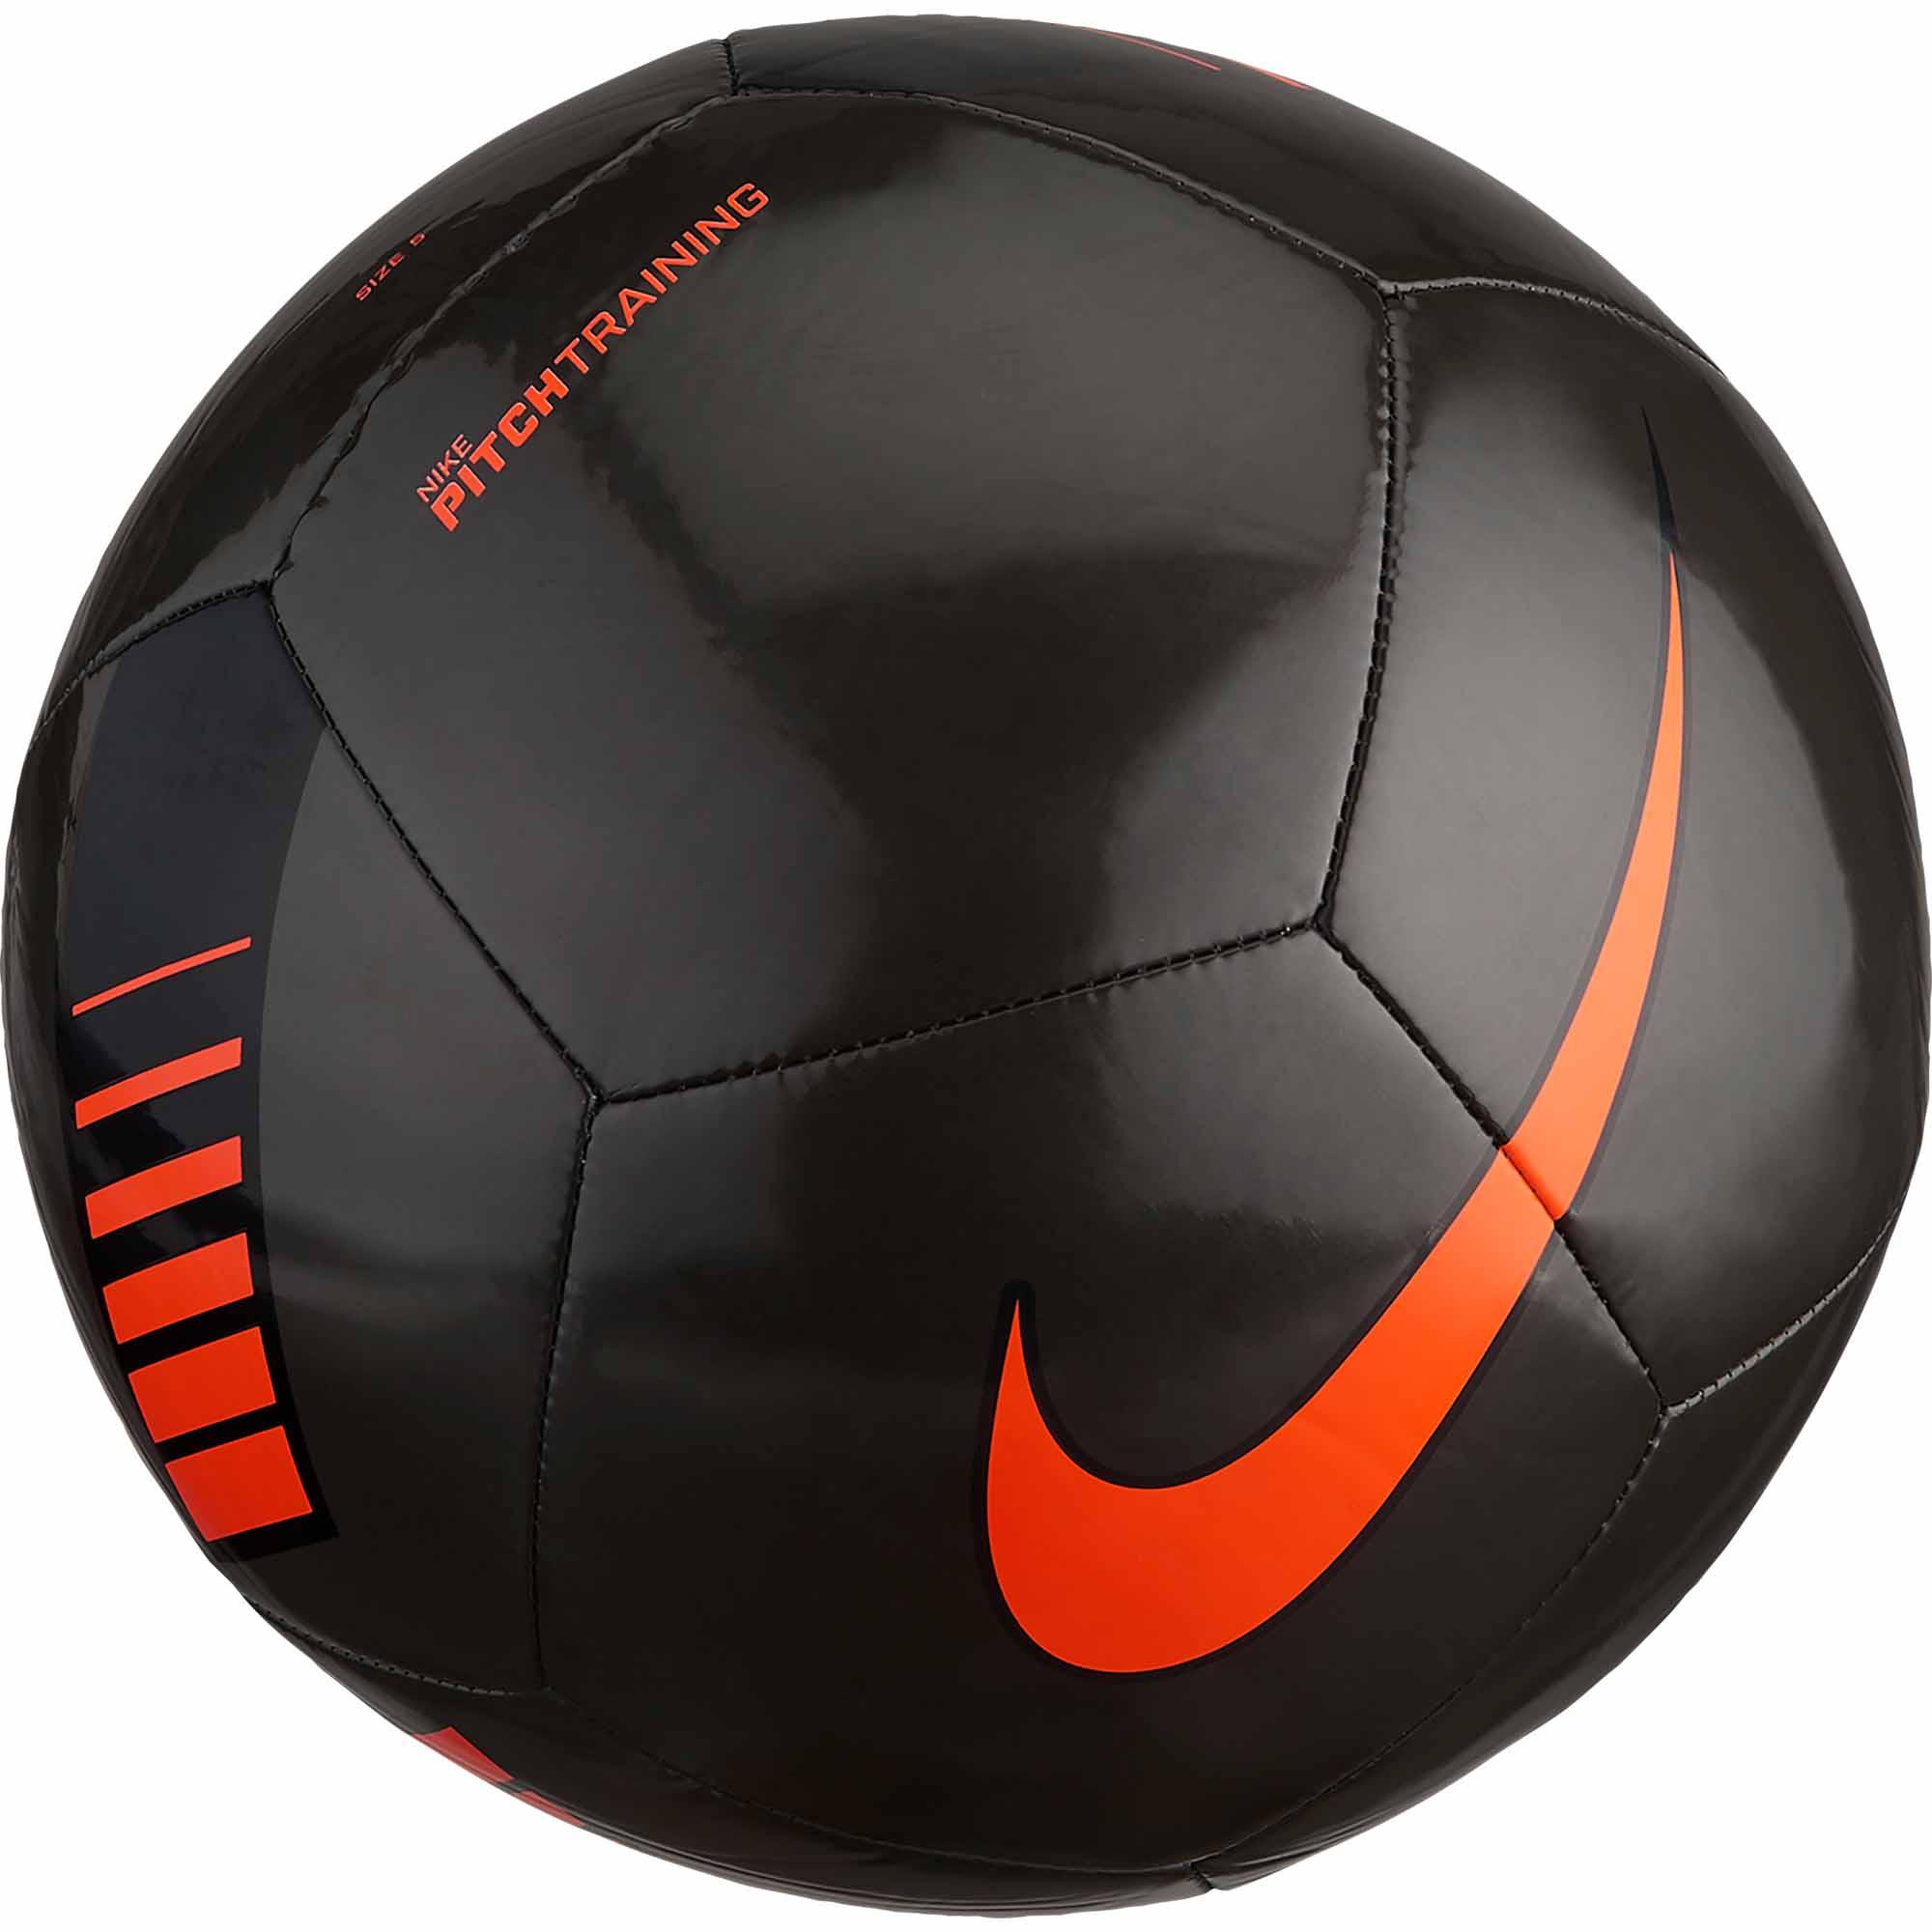 47e6f416d Nike Pitch Training Soccer Ball – Metallic Black Total Orange